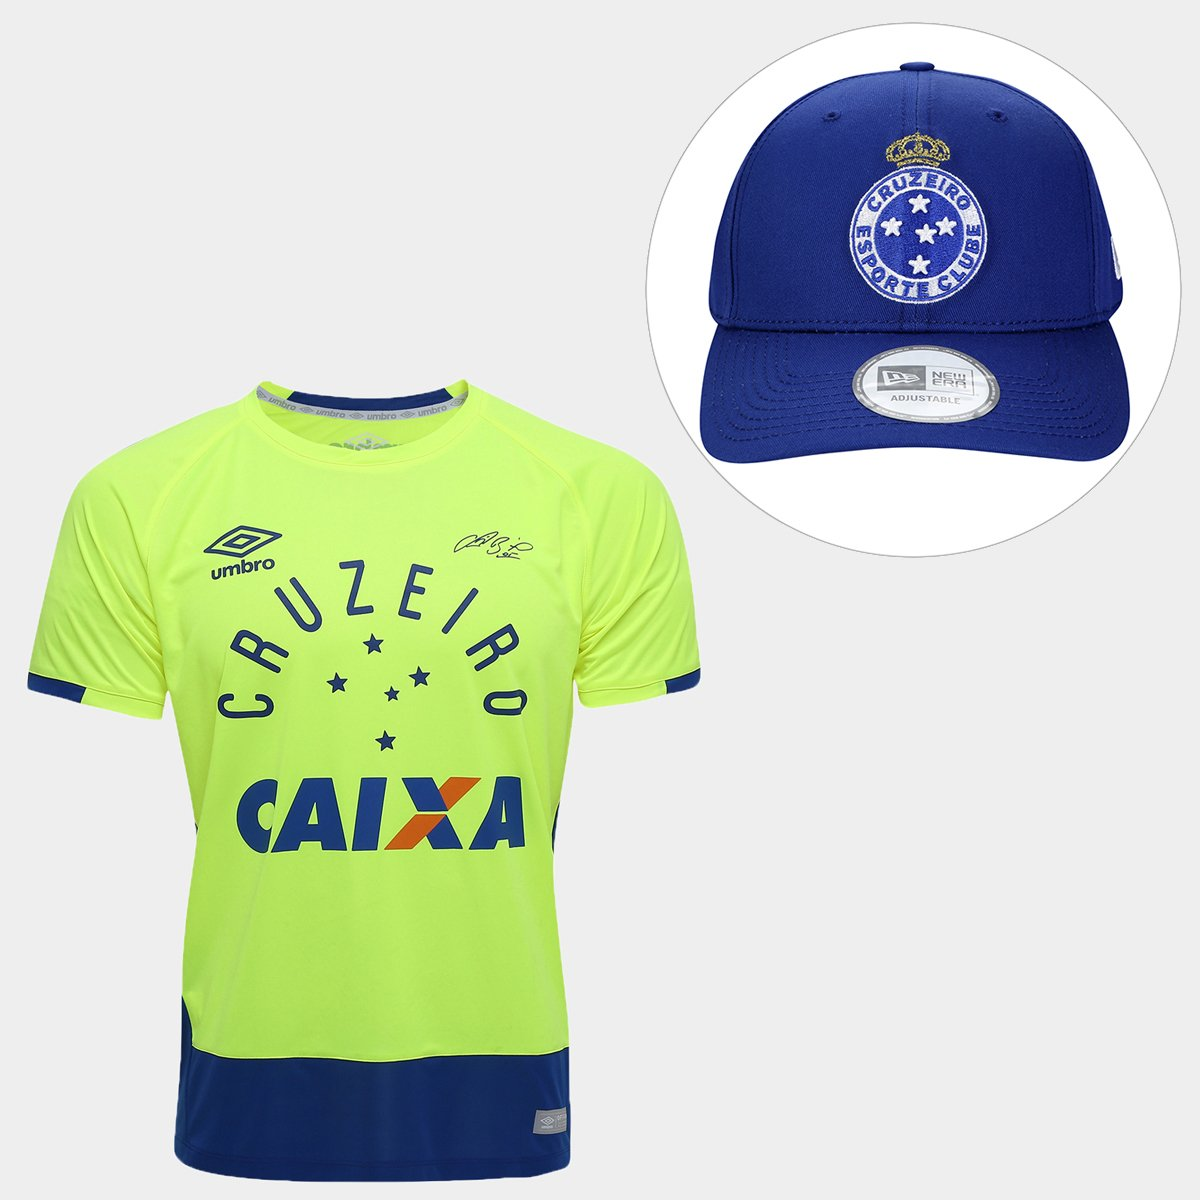 fadbb78dde946 Kit Camisa Umbro Cruzeiro Goleiro 2016 nº 1 - Fábio + Boné New Era Cr..